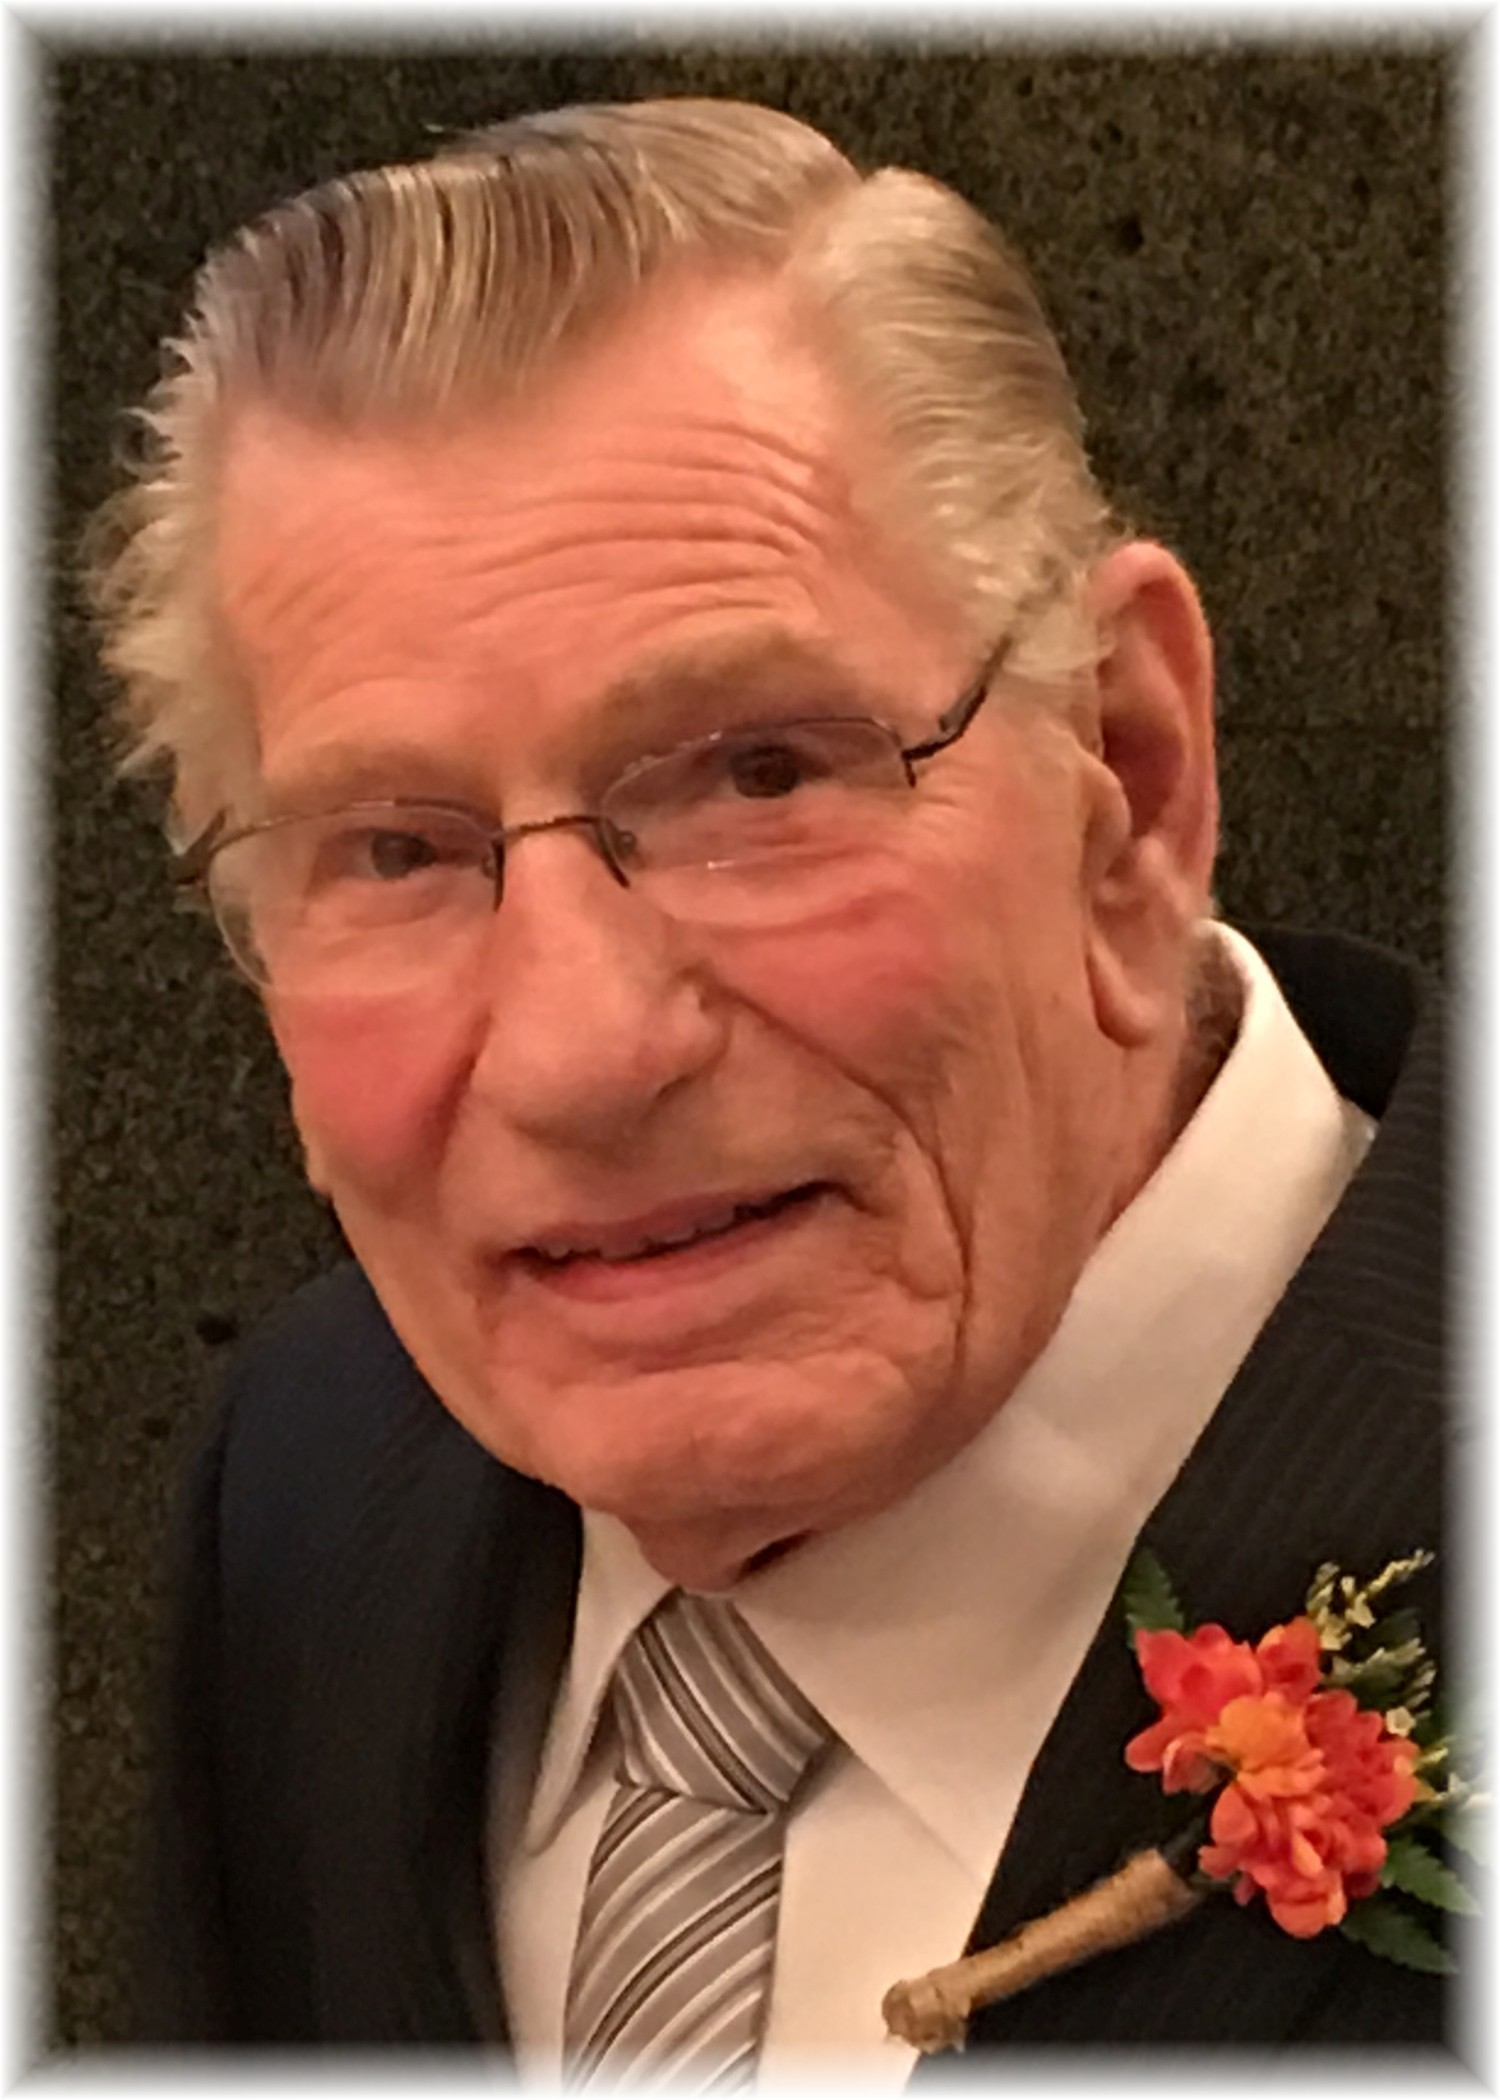 Charles W. Stroth